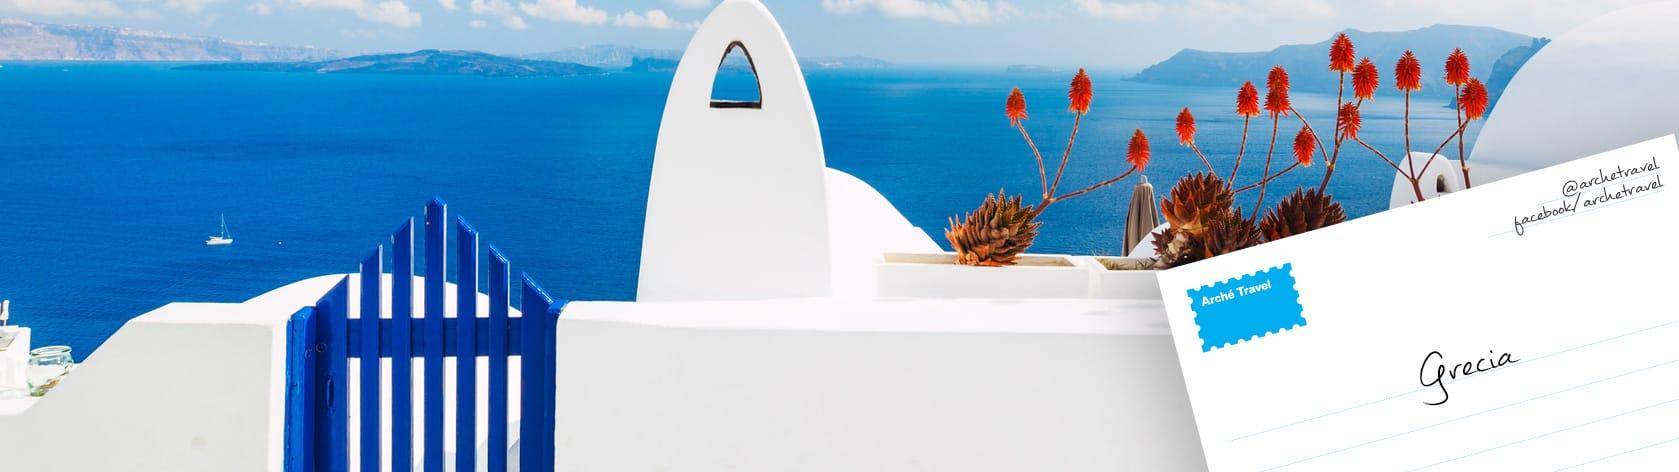 Tour Grecia - Viaggi Grecia - Tour Operator Grecia